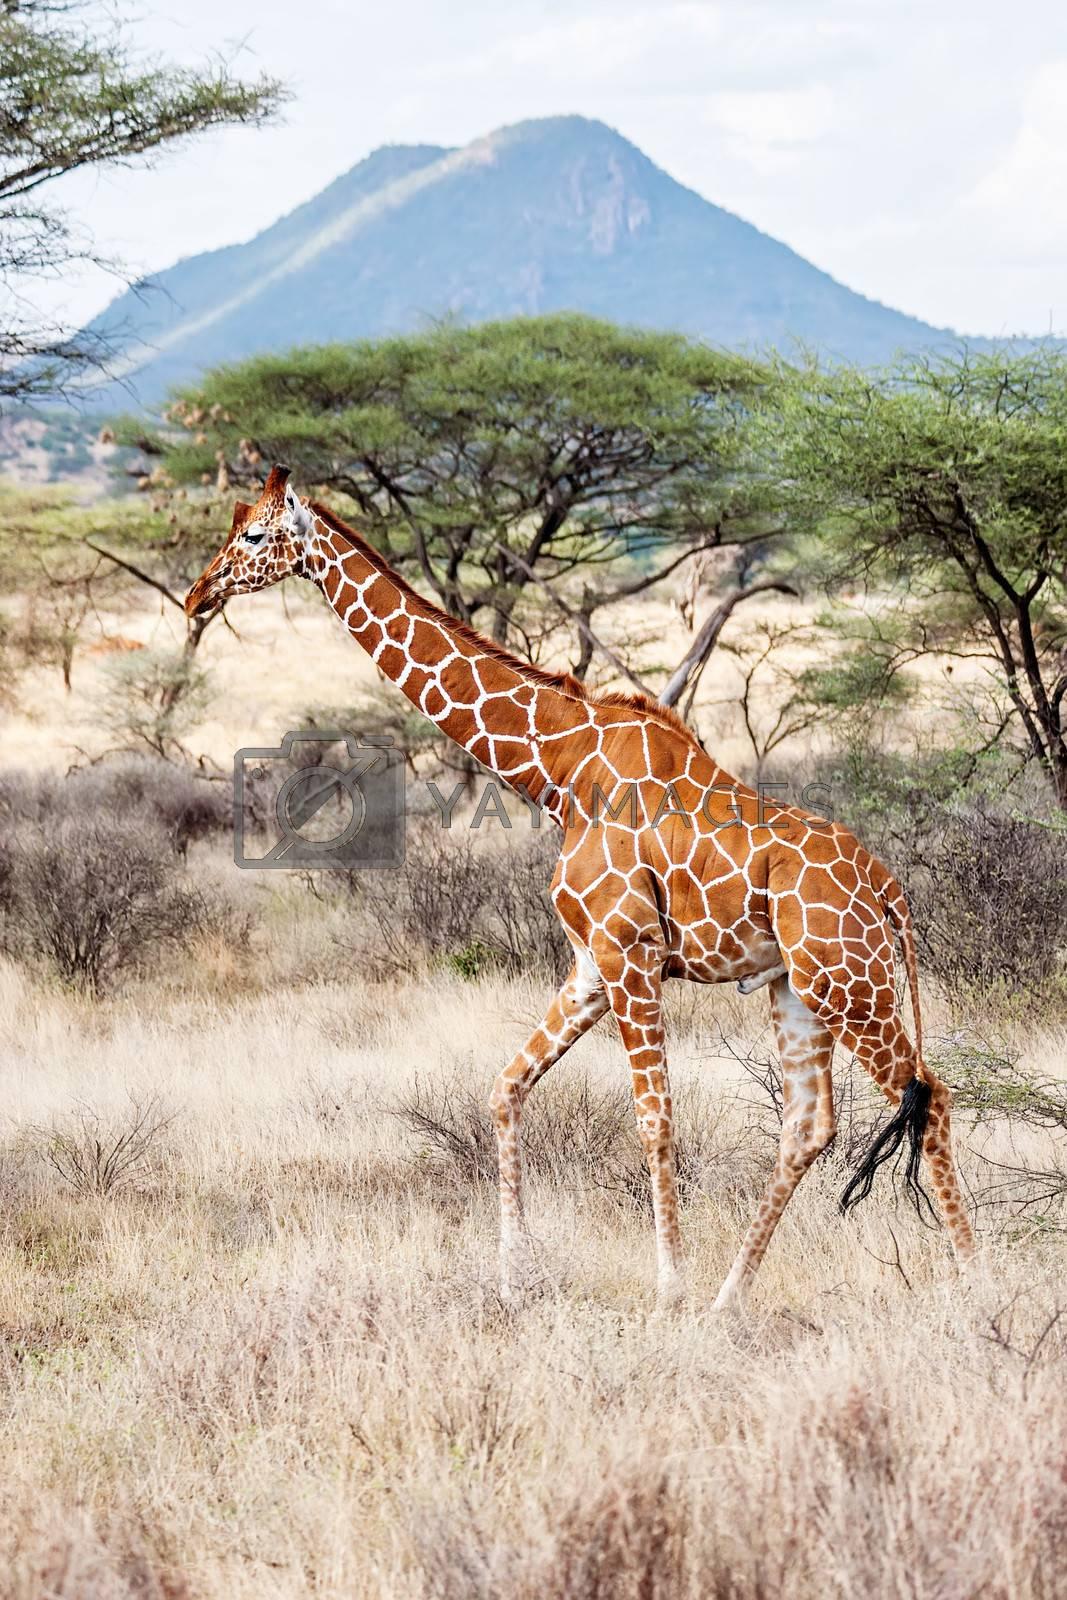 Reticulated Giraffe walking in the Savannah. Samburu, Kenya. Scientific name: Giraffa camelopardalis reticulata